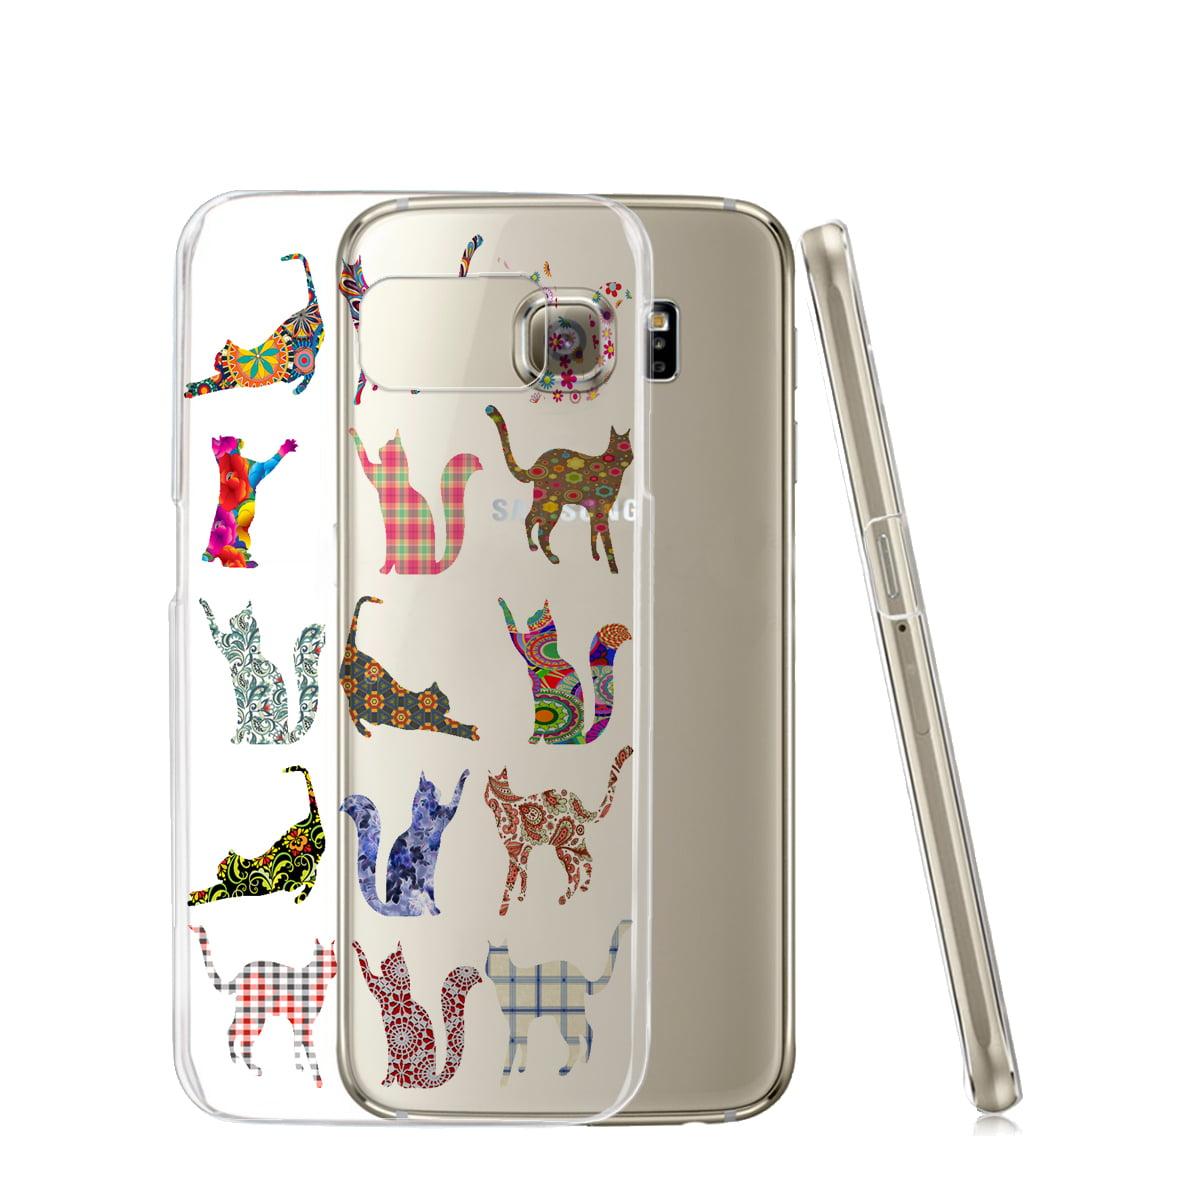 KuzmarK™ Samsung Galaxy S6 Edge Clear Cover Case - Kitty Cat